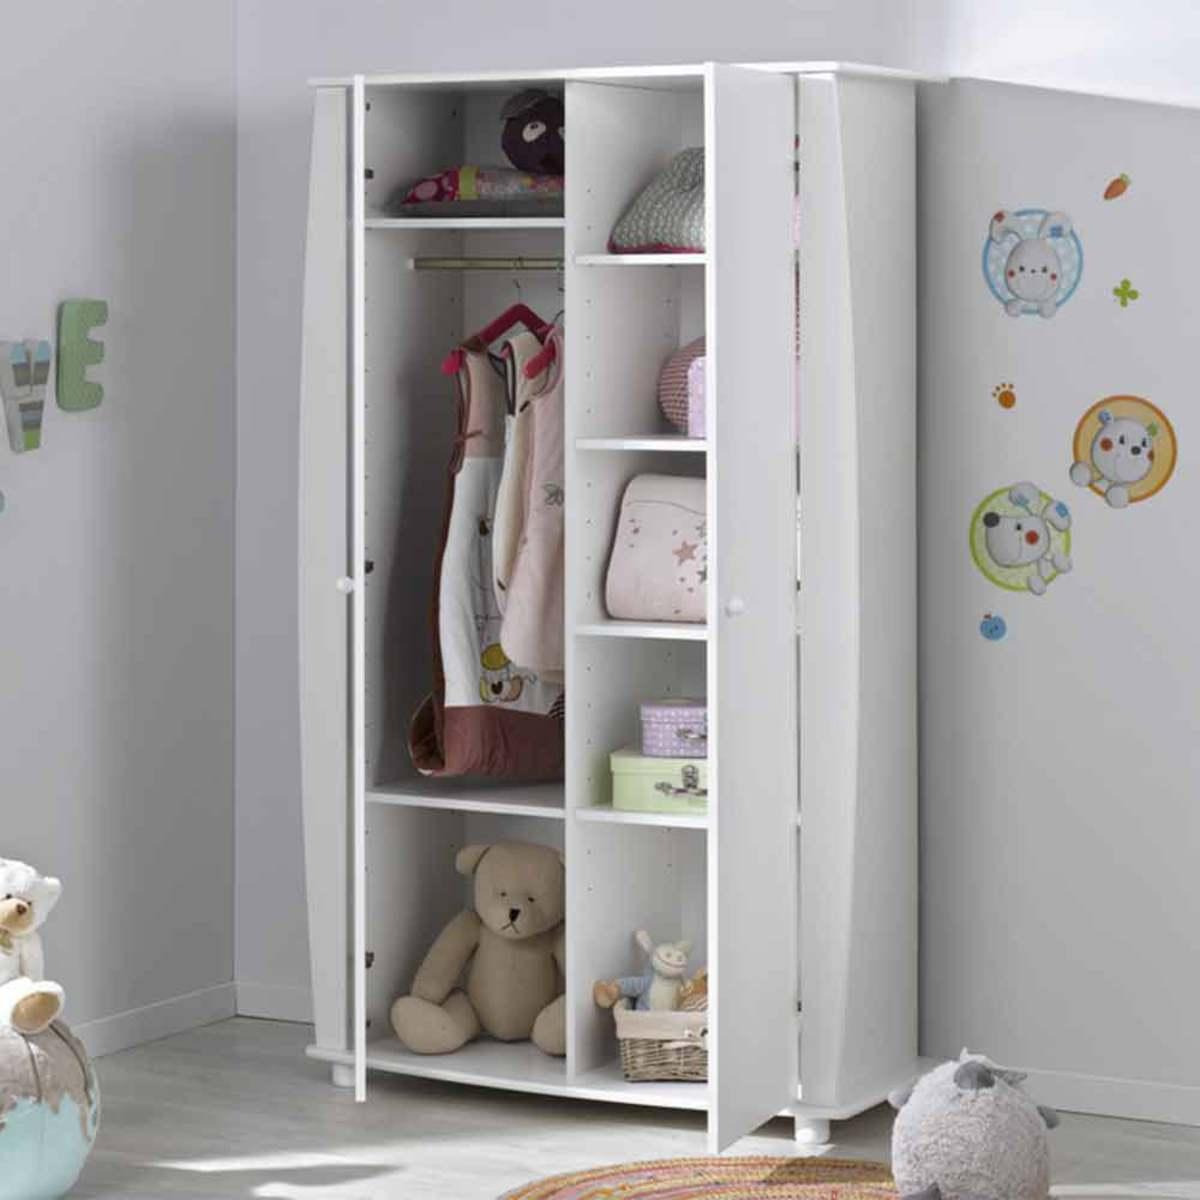 B b provence armoire m d a blanc armoire b b provence - L armoire de bebe ...